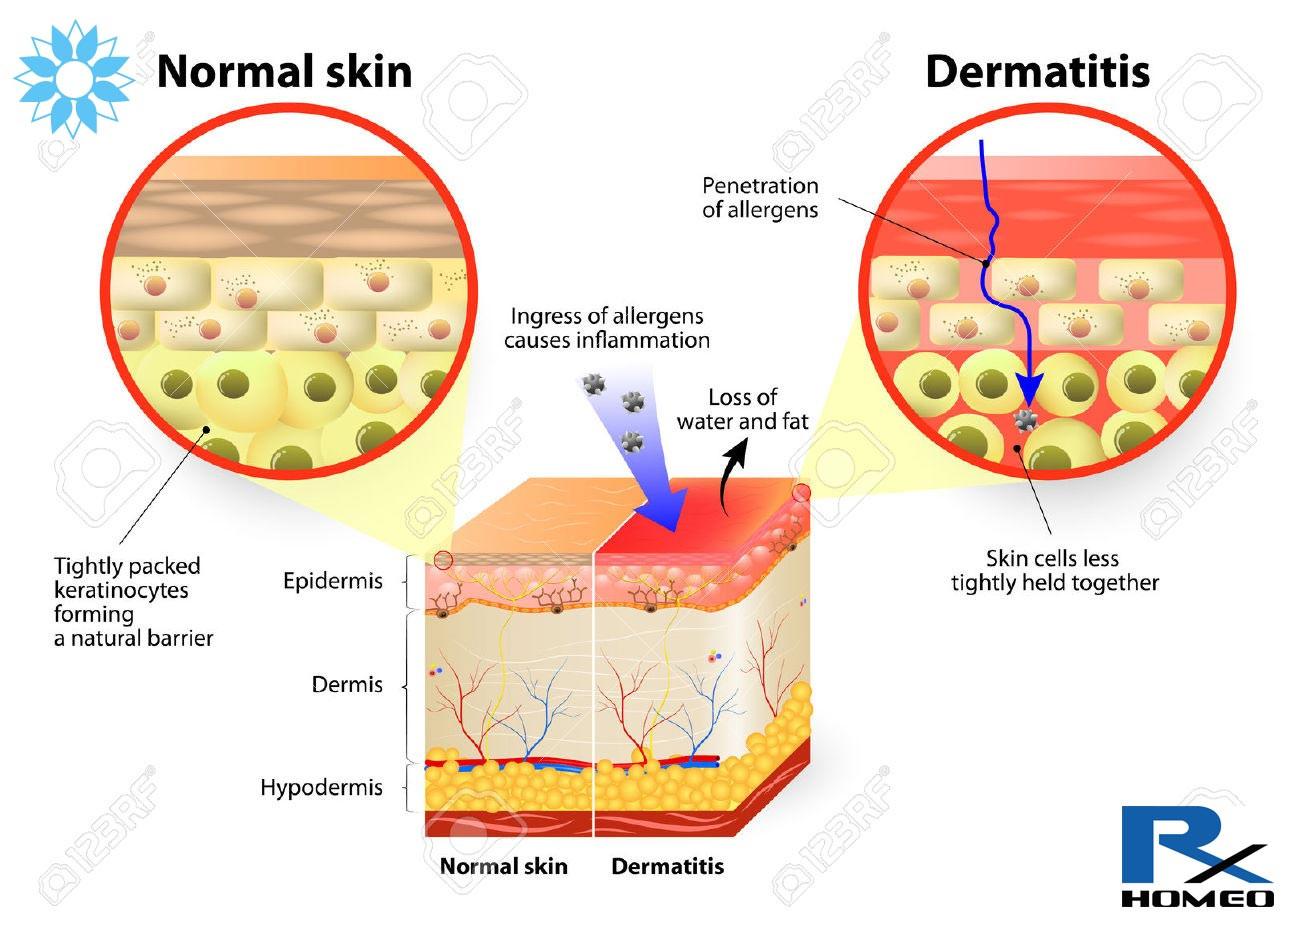 Eczema, Dermatitis - remedies in homeopathy